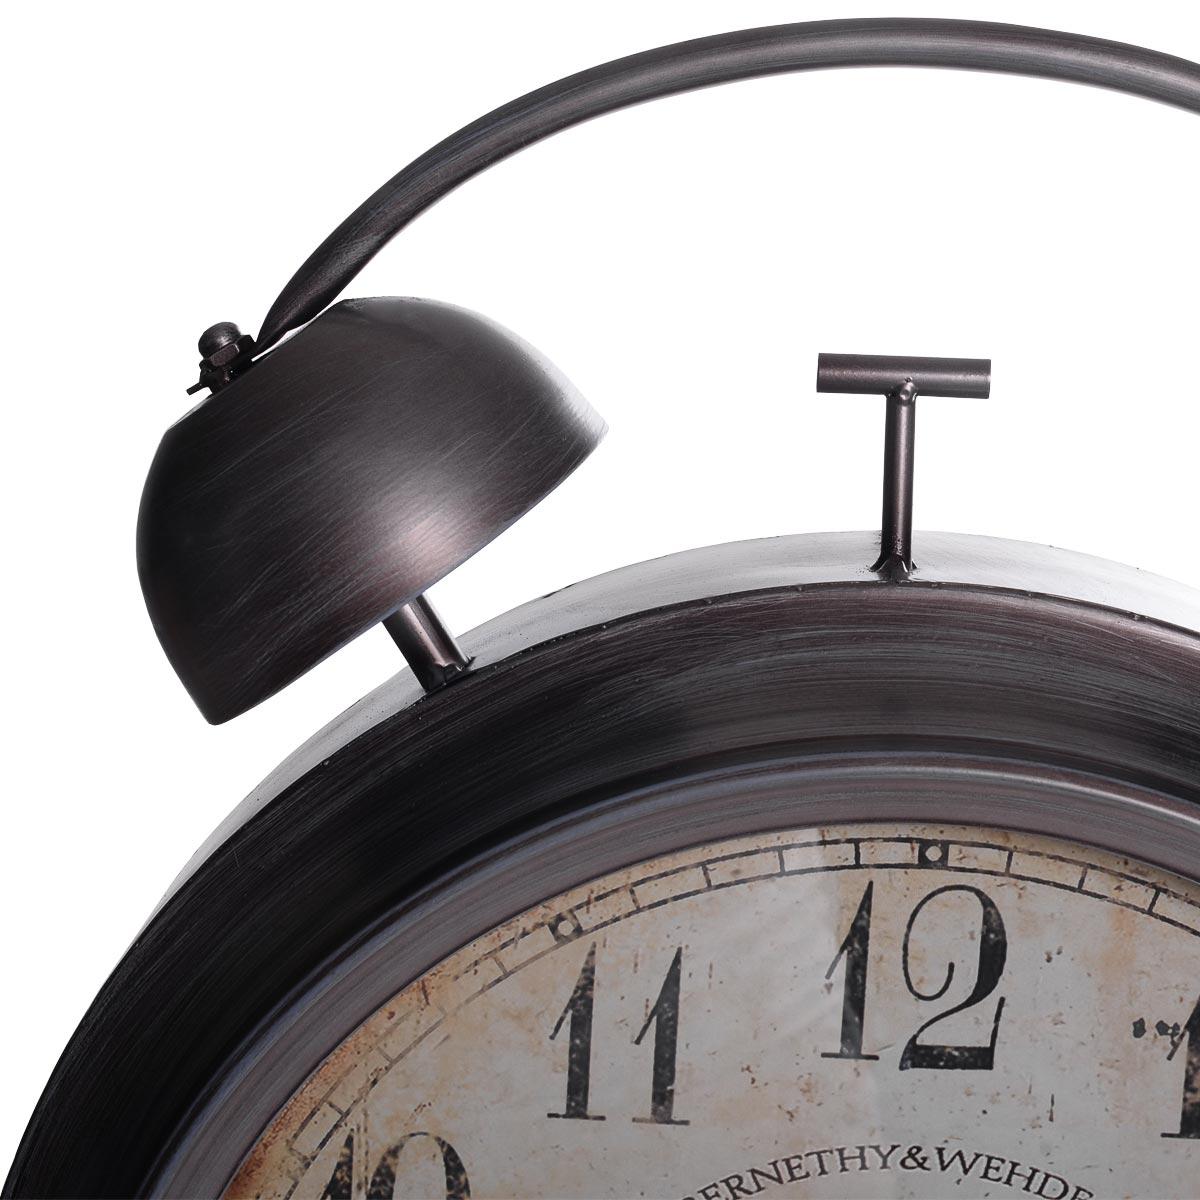 Vintage χειροποίητο διακοσμητικό ρολόι μεταλλικό - ΟΕΜ 52316